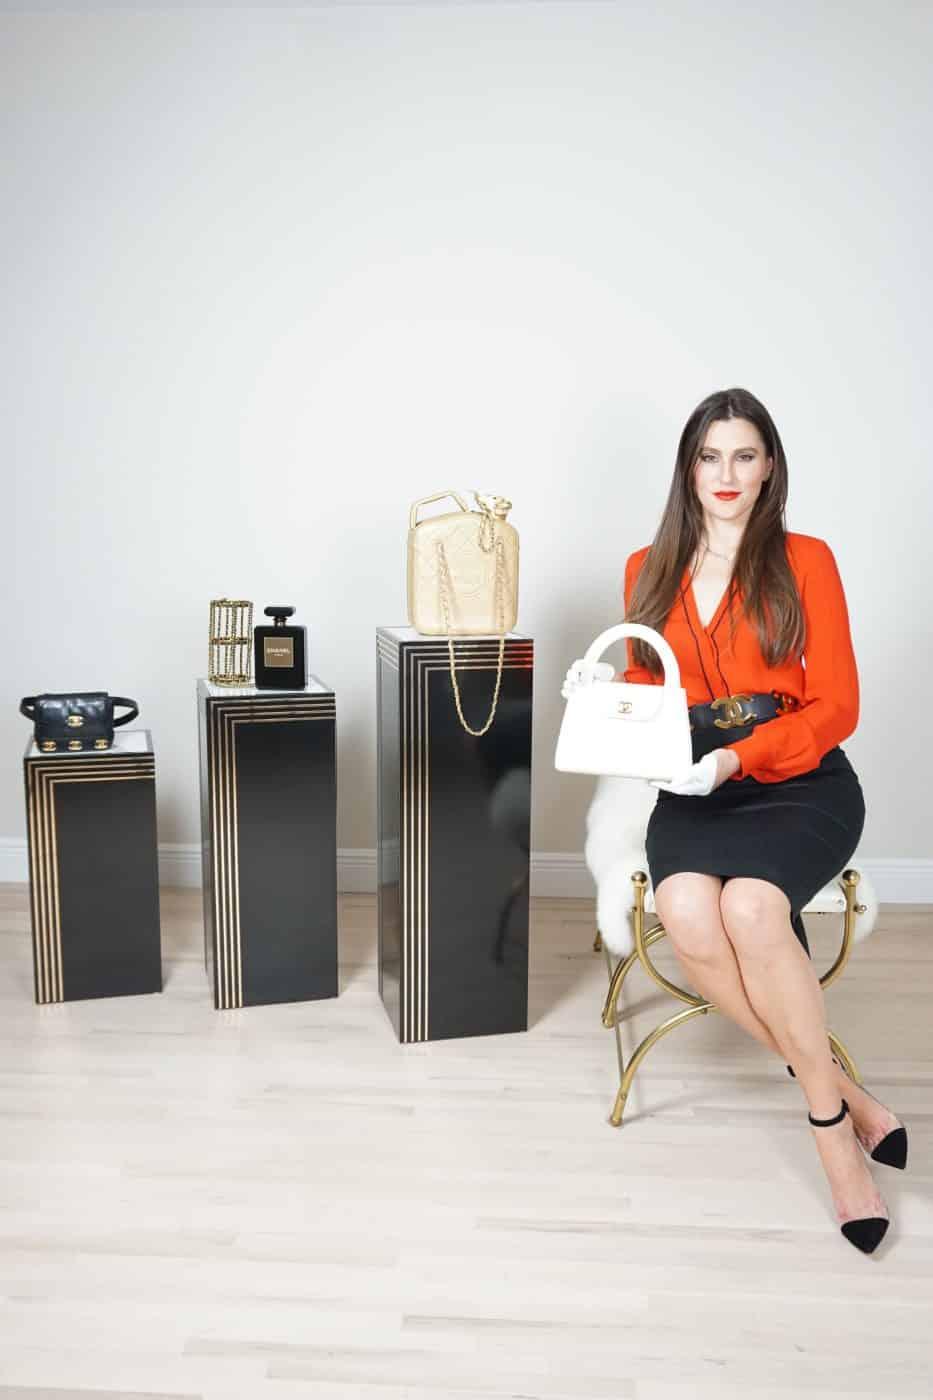 Mila Evertz, founder of HOUSE OF CARVER, with rare Chanel handbags